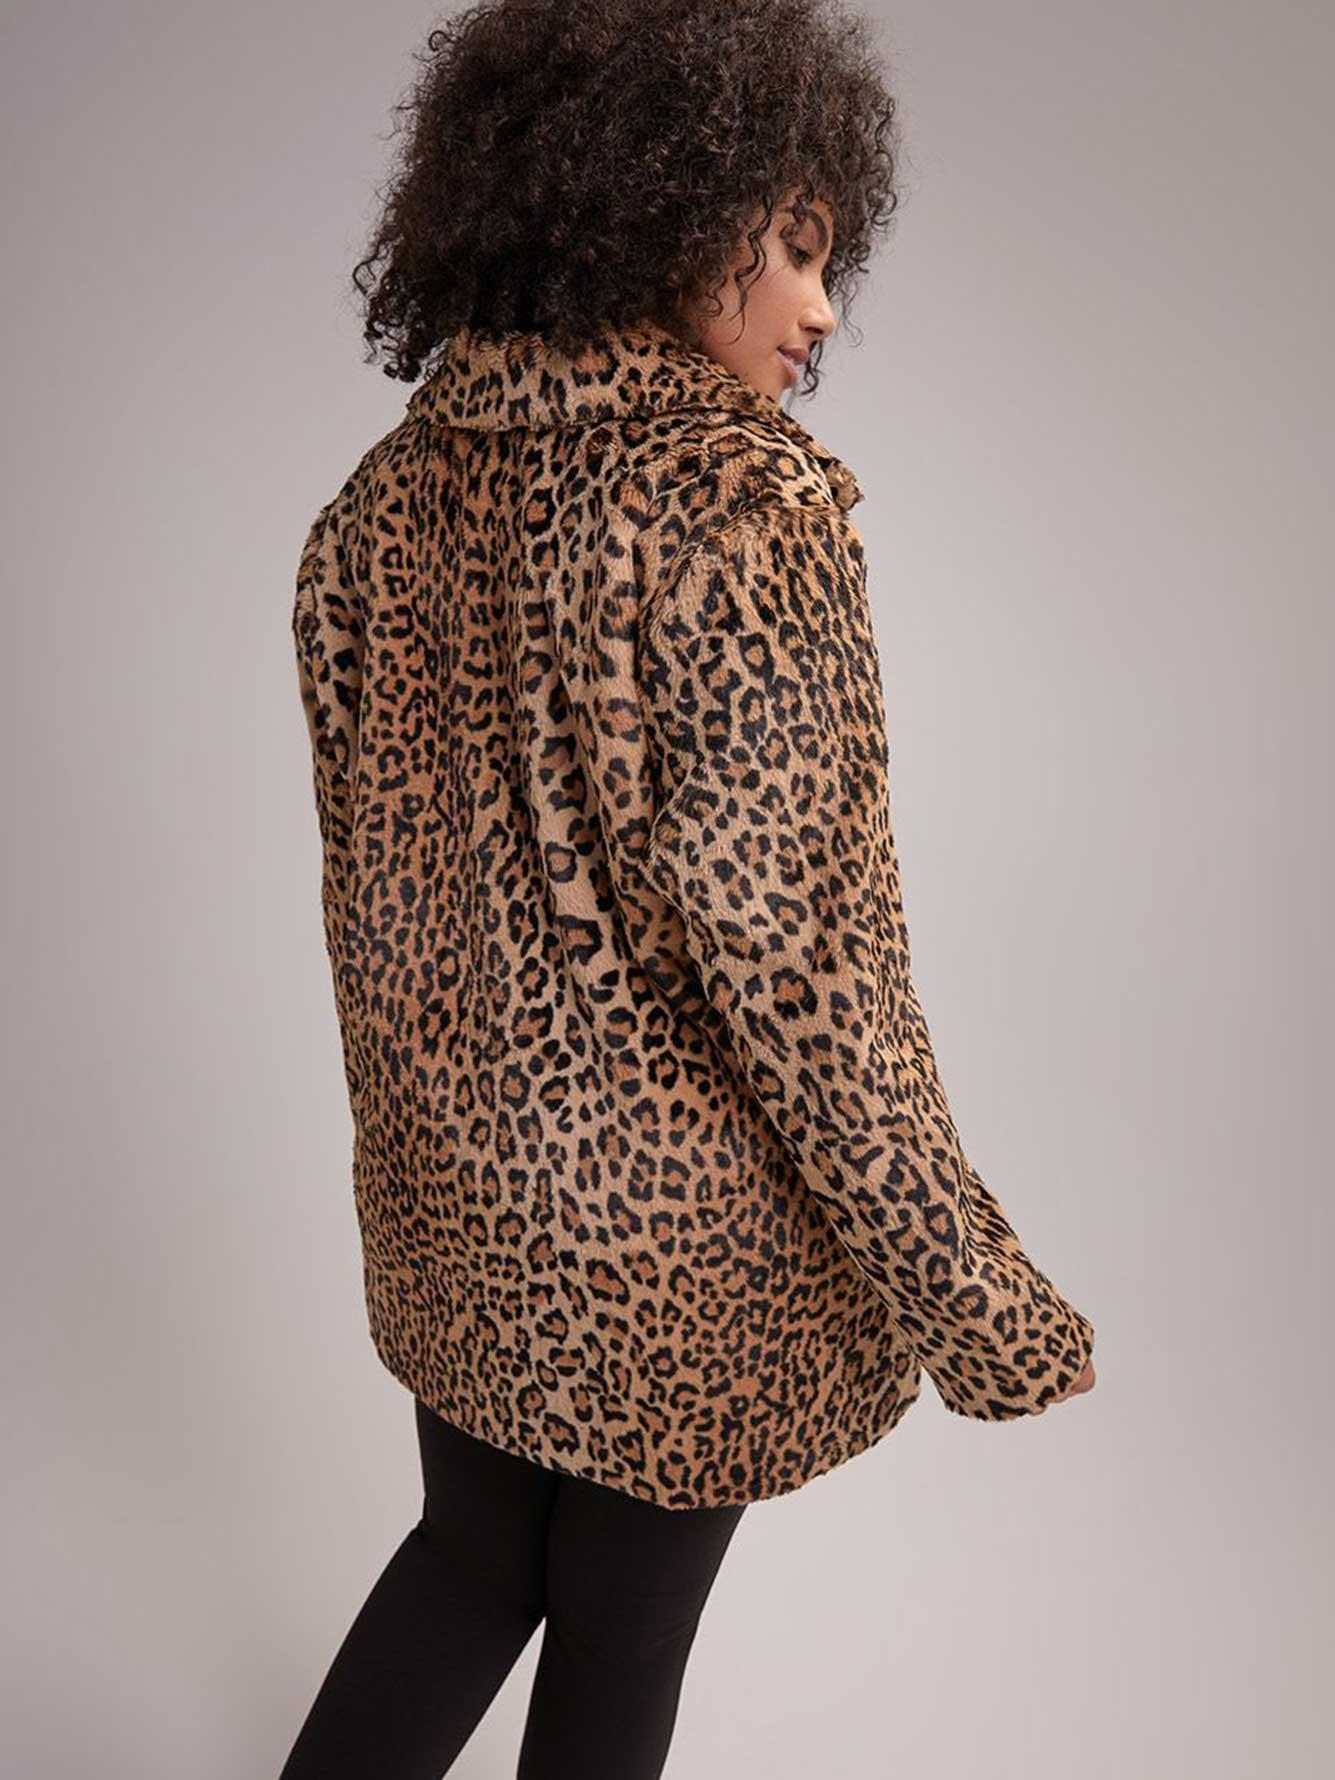 74a743972a9d Cheetah Print Faux Fur Coat - Michel Studio | Addition Elle